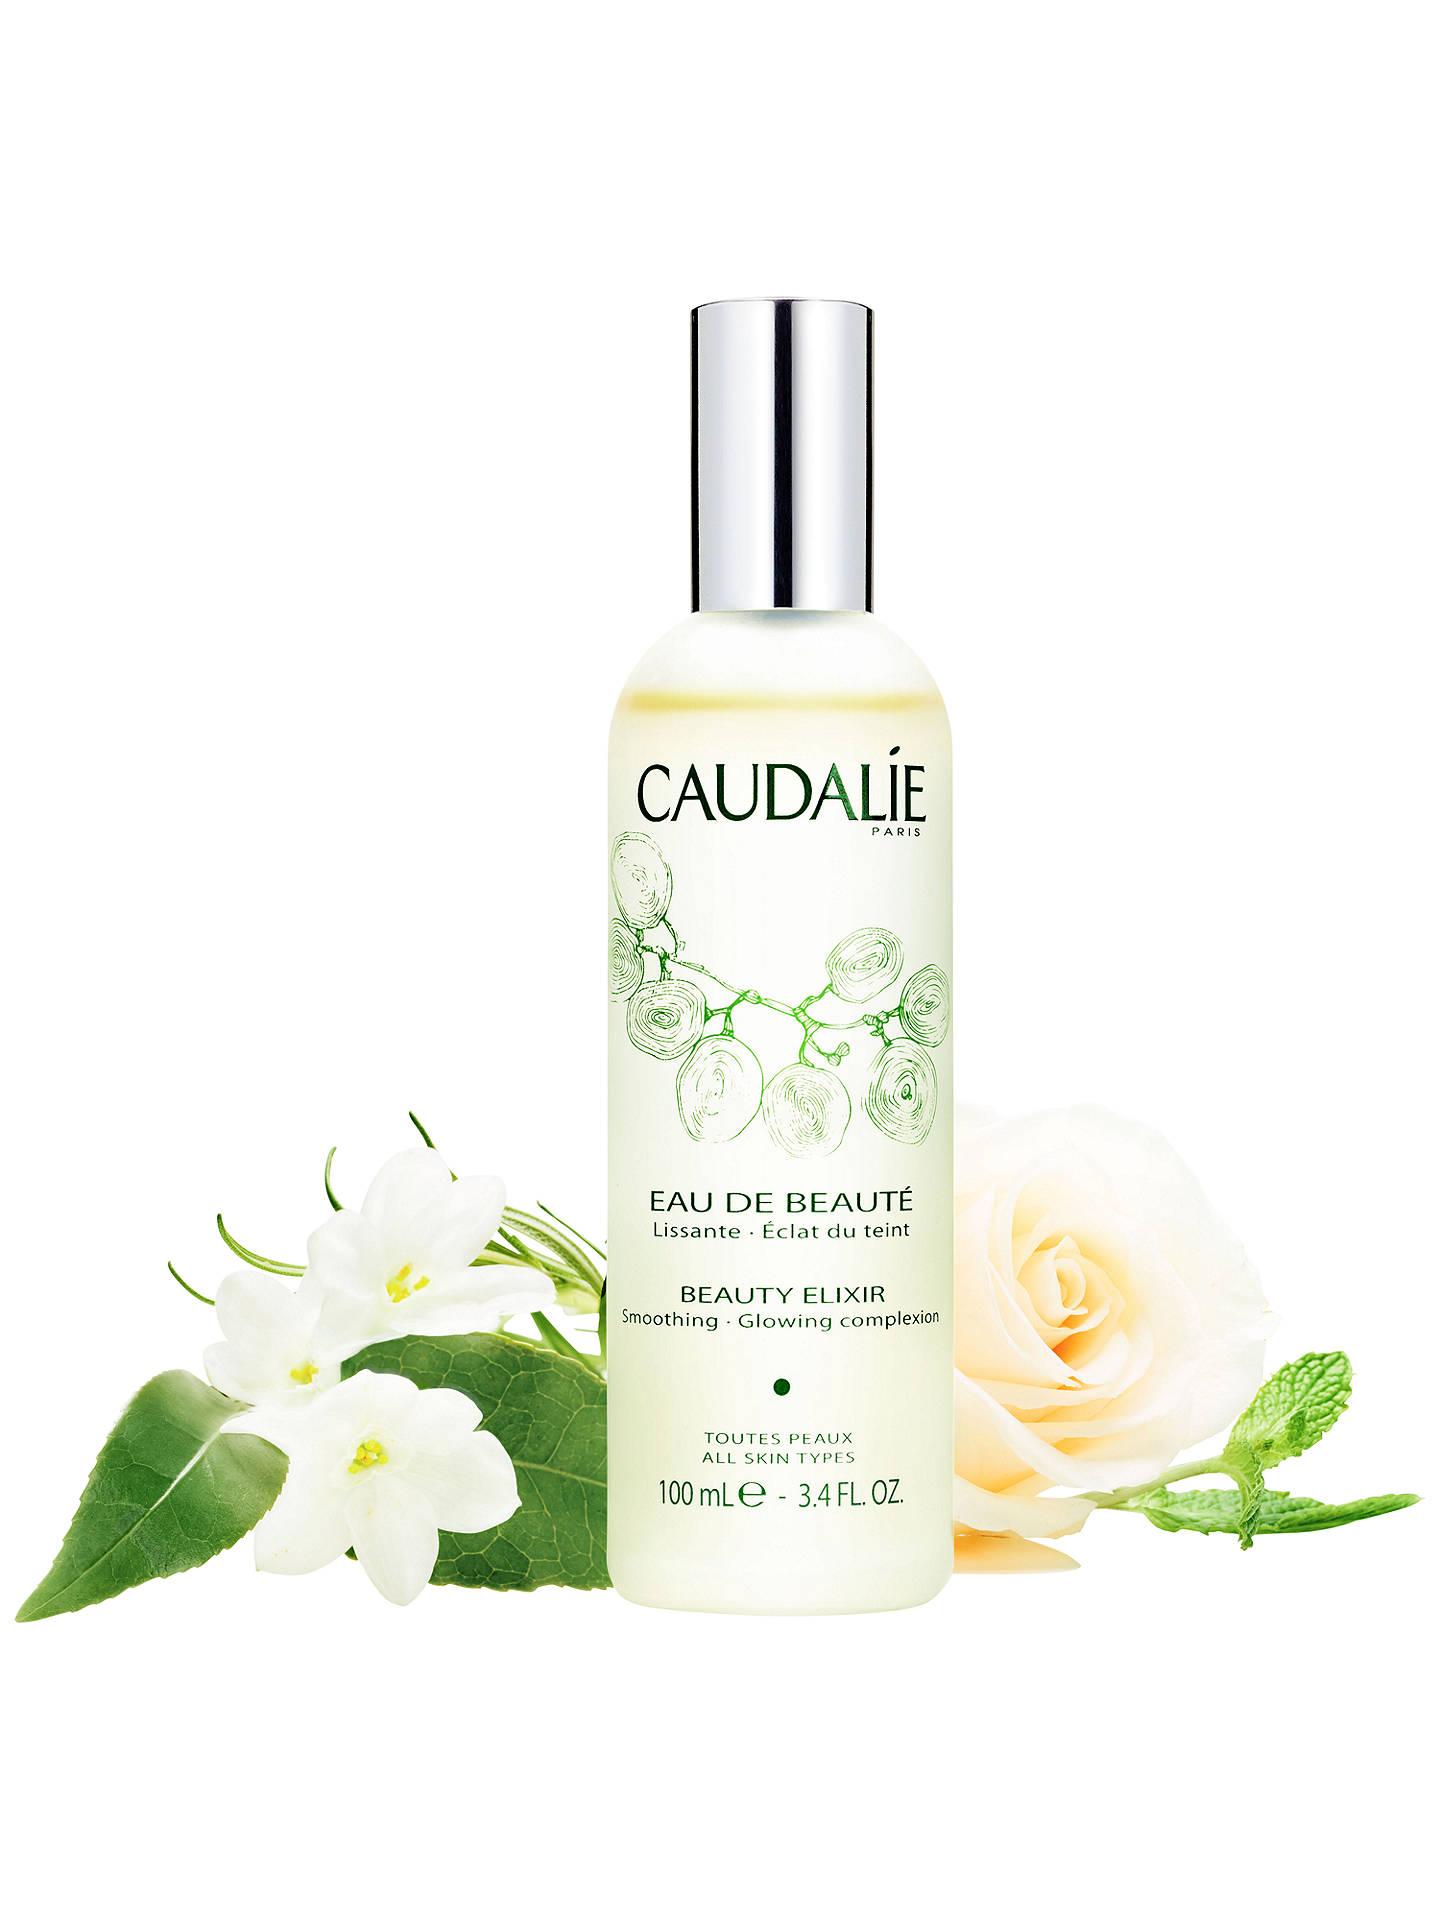 caudalie beauty elixir ingredients